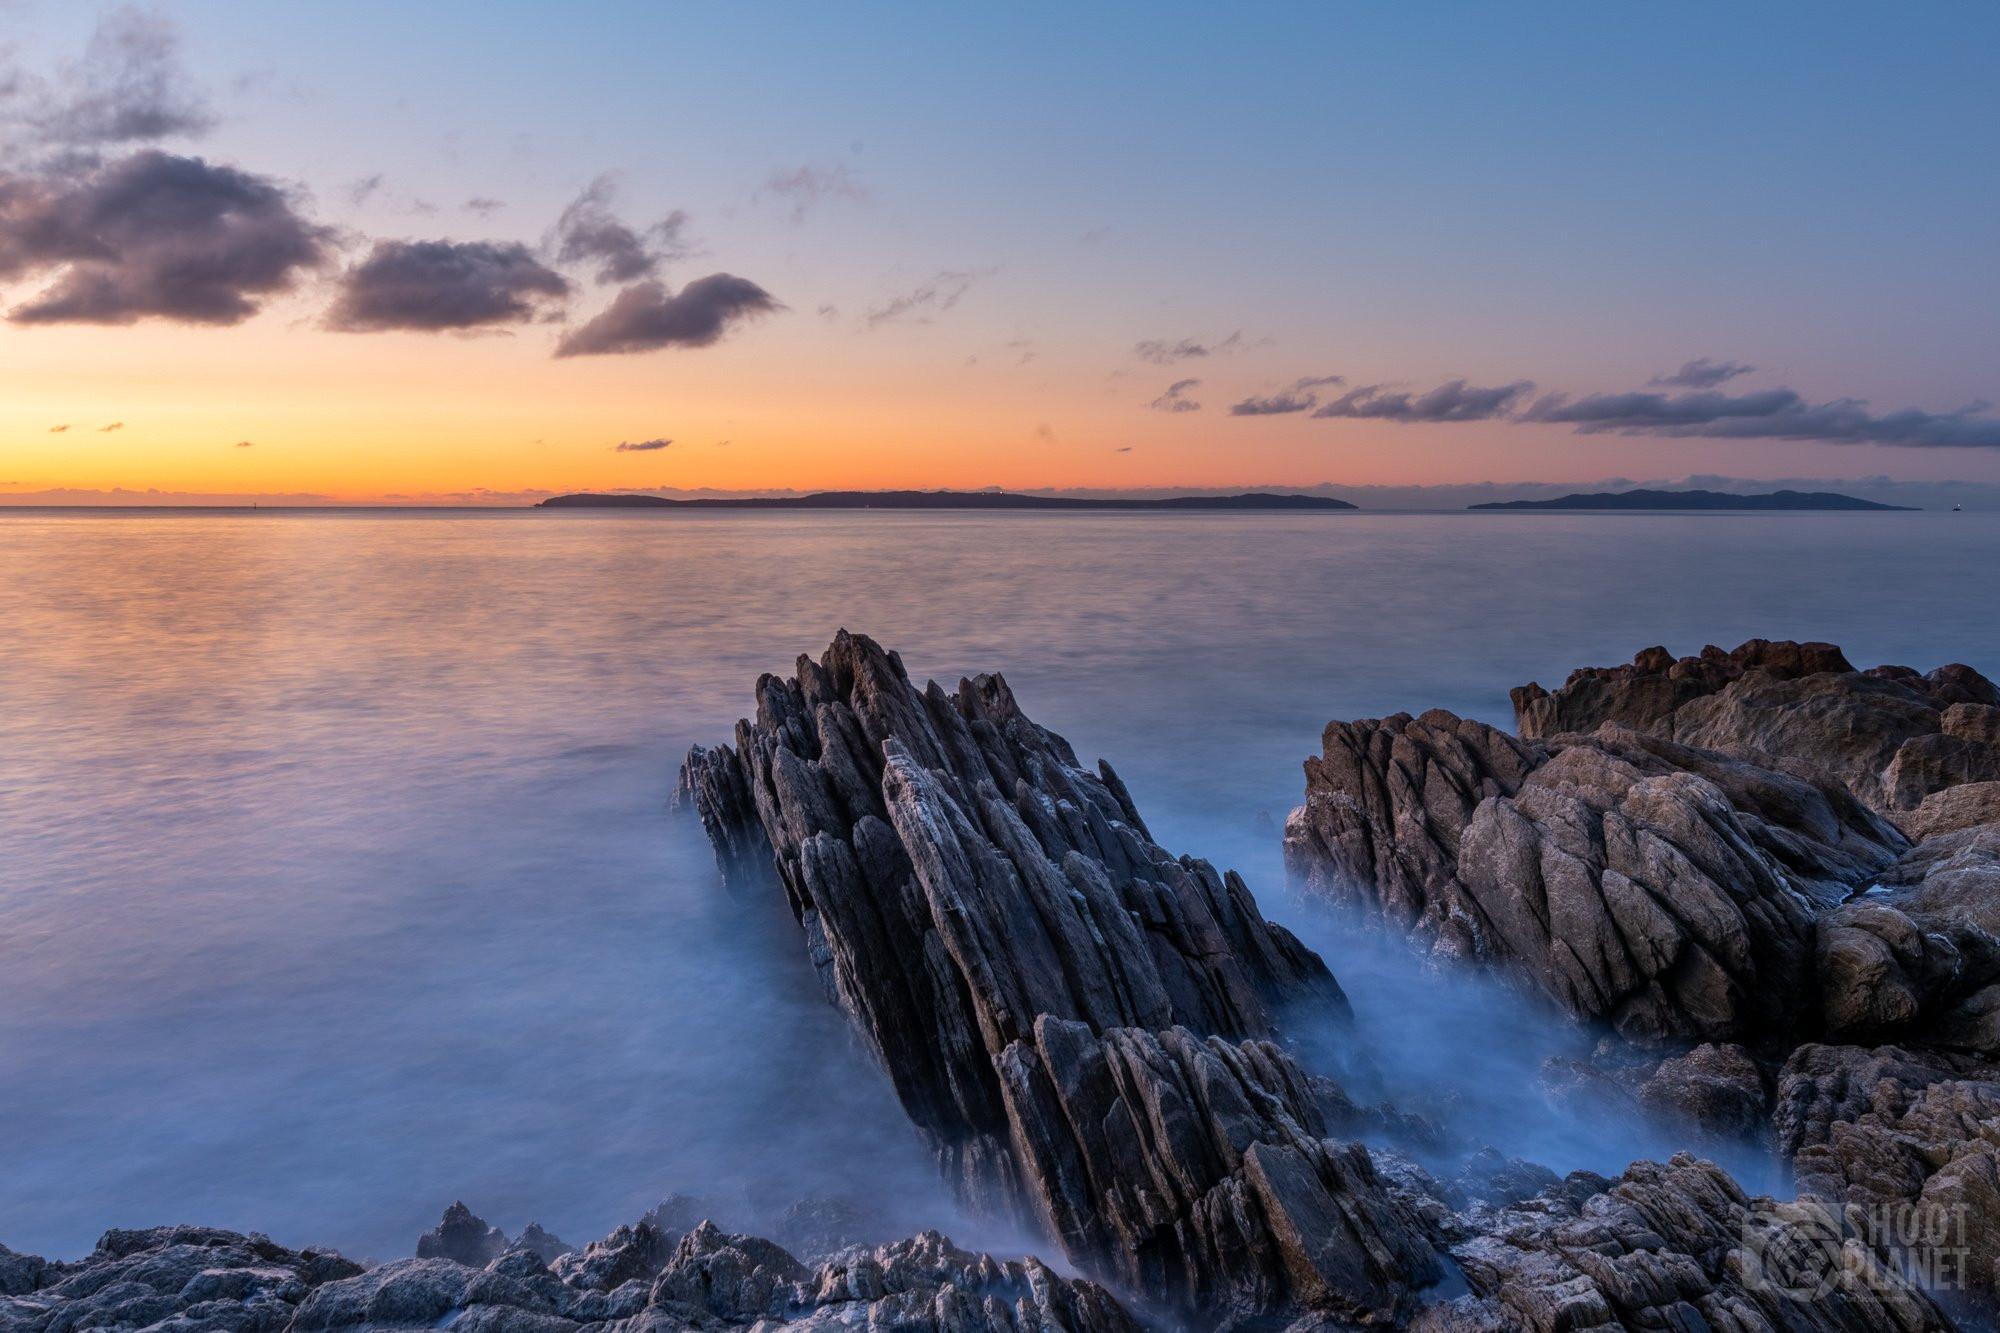 Sunrise on pointe Layet rocks, Lavandou France